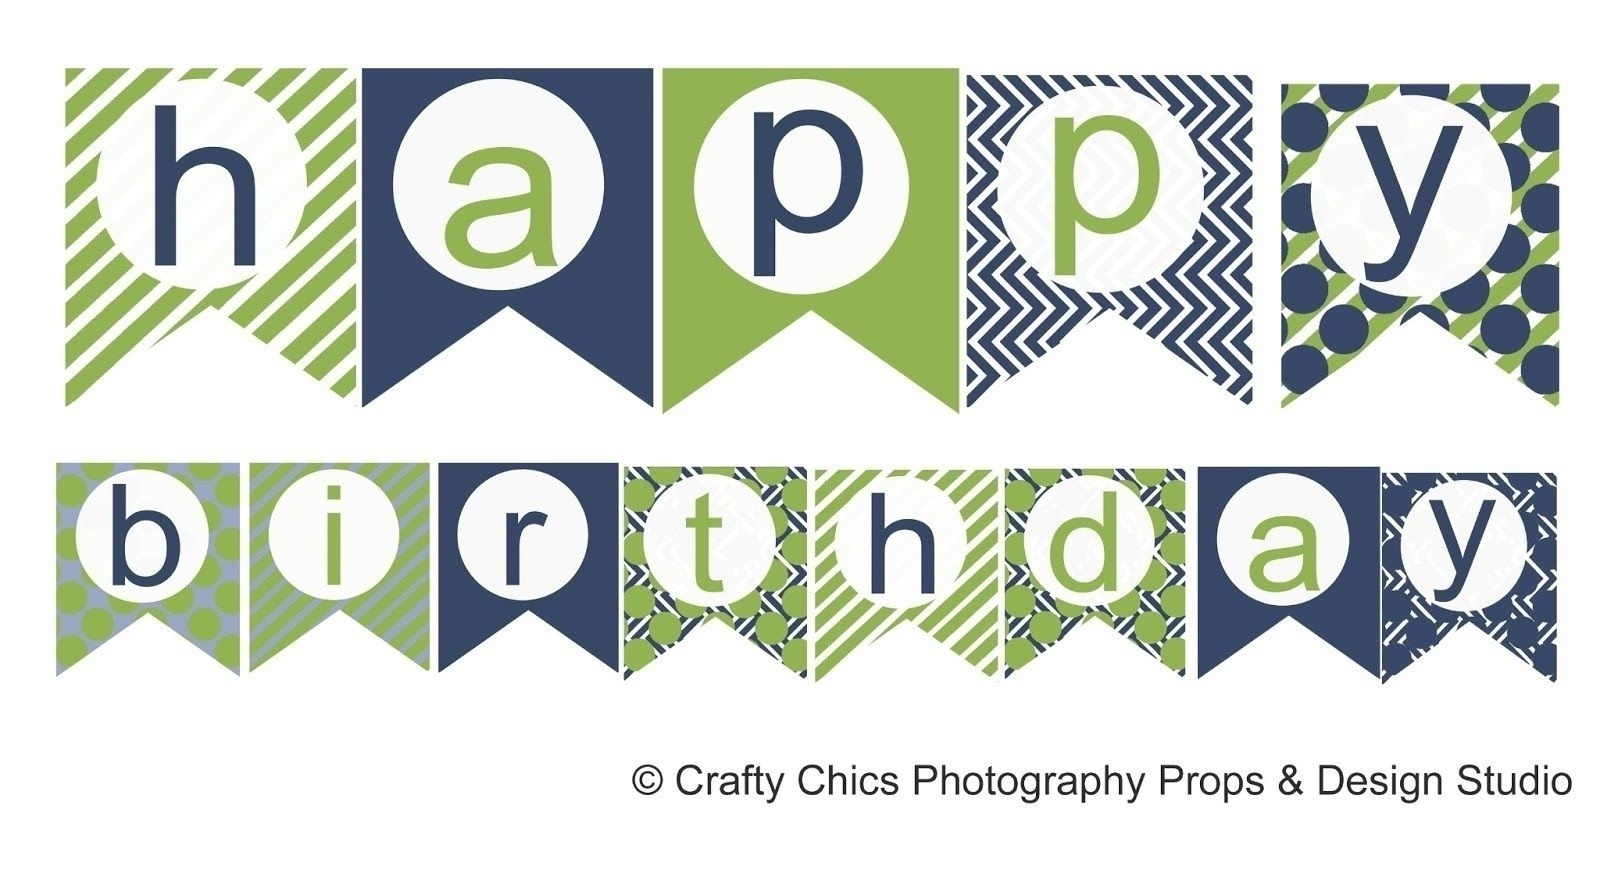 Free Printable Happy Birthday Banner Templates | Bestprintable231118 - Free Printable Happy Birthday Banner Templates